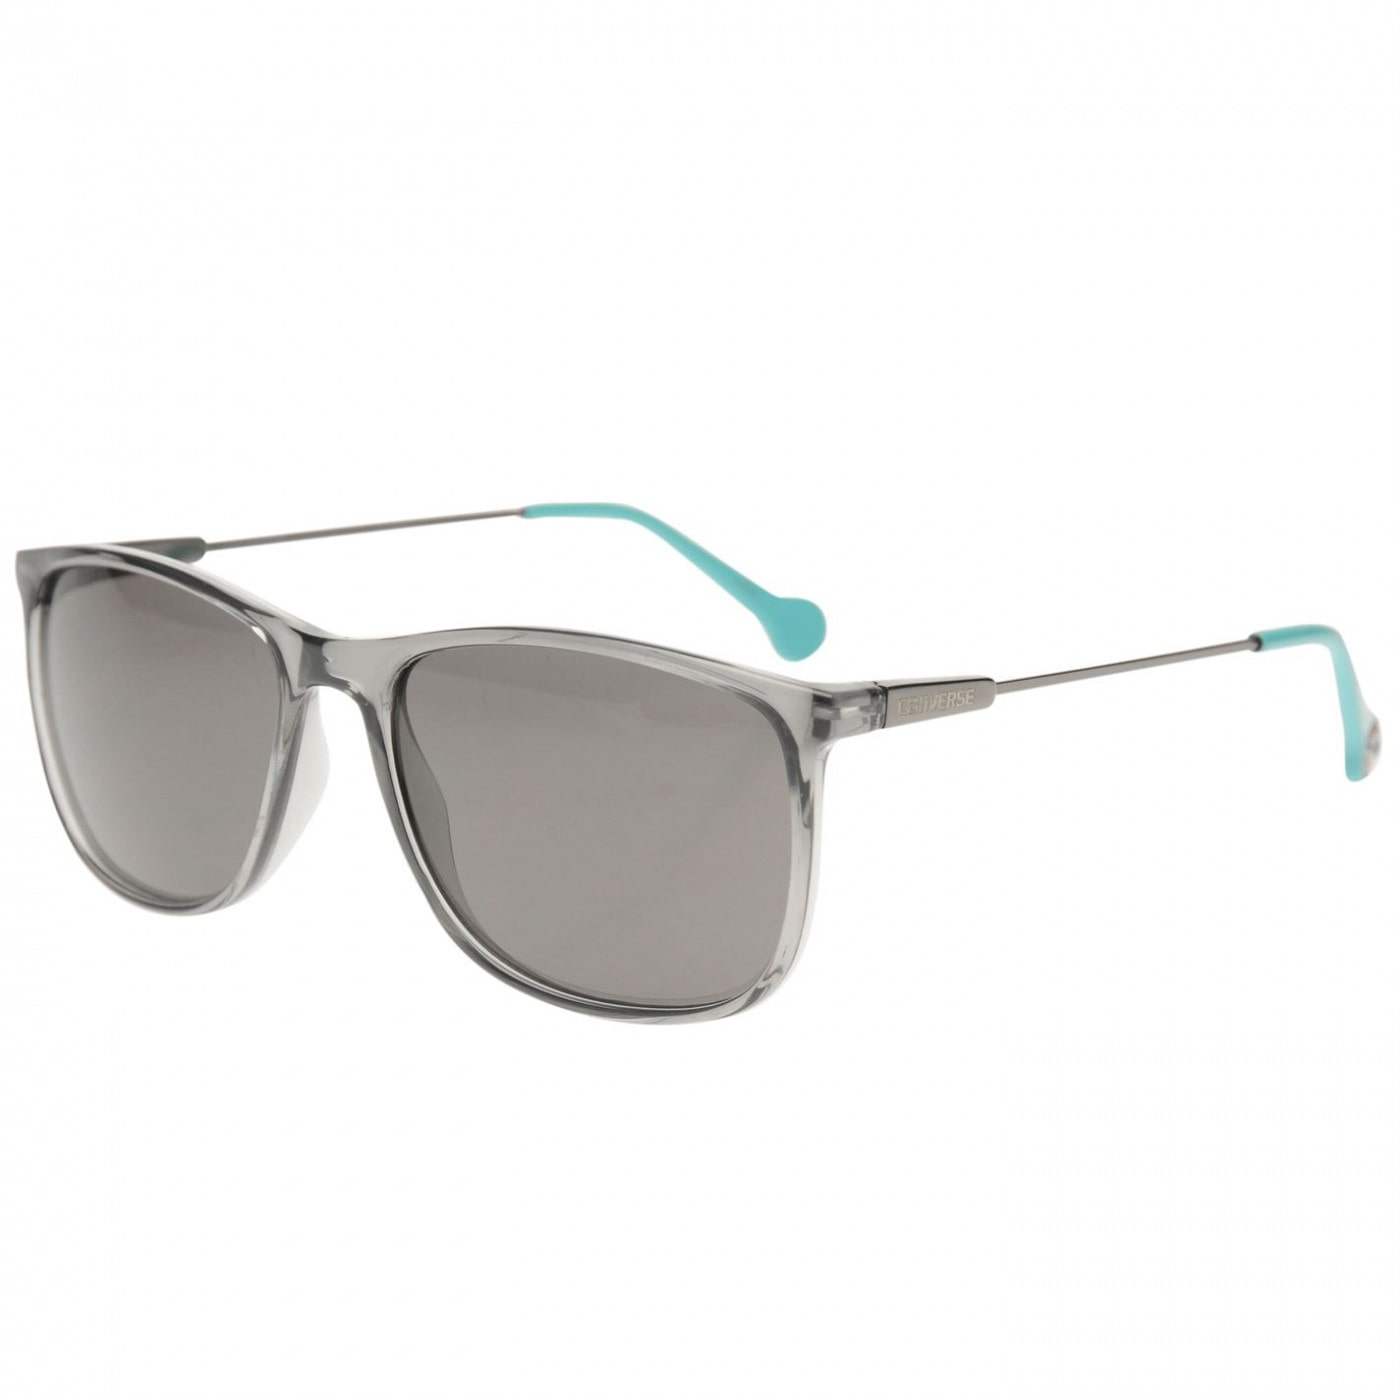 Converse H035 Sunglasses